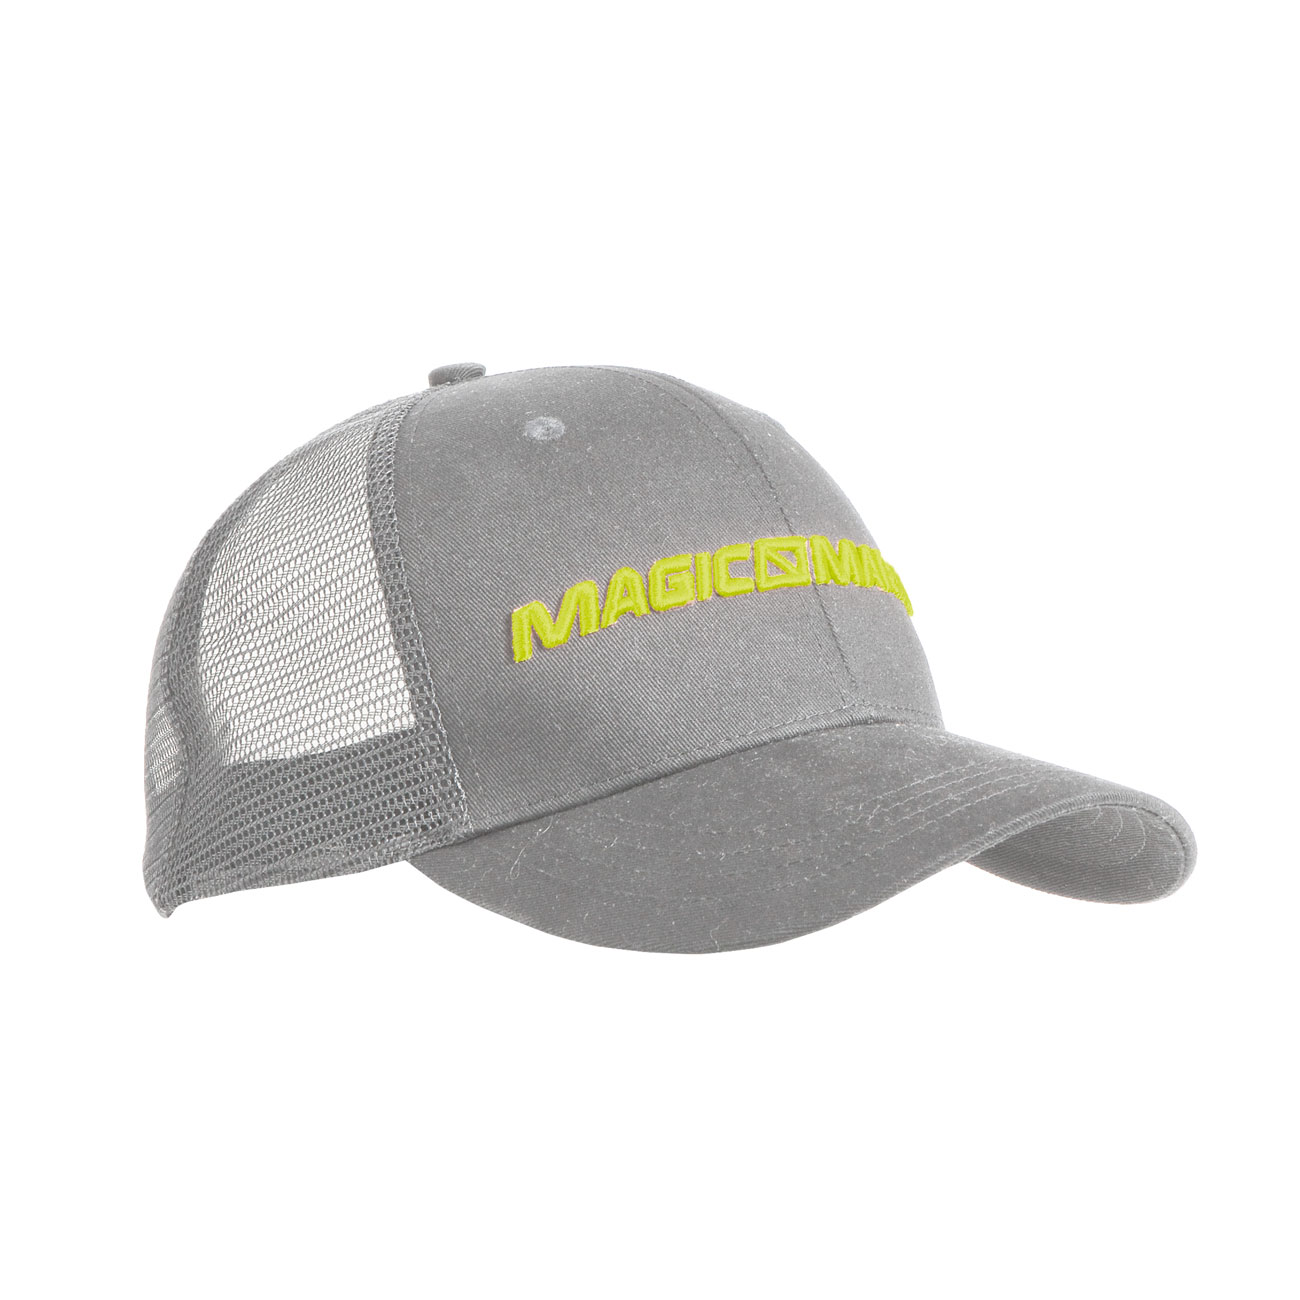 af2c5af273bf76 Magic Marine Damen Herren Schirmmütze Mesh Baseball Cap